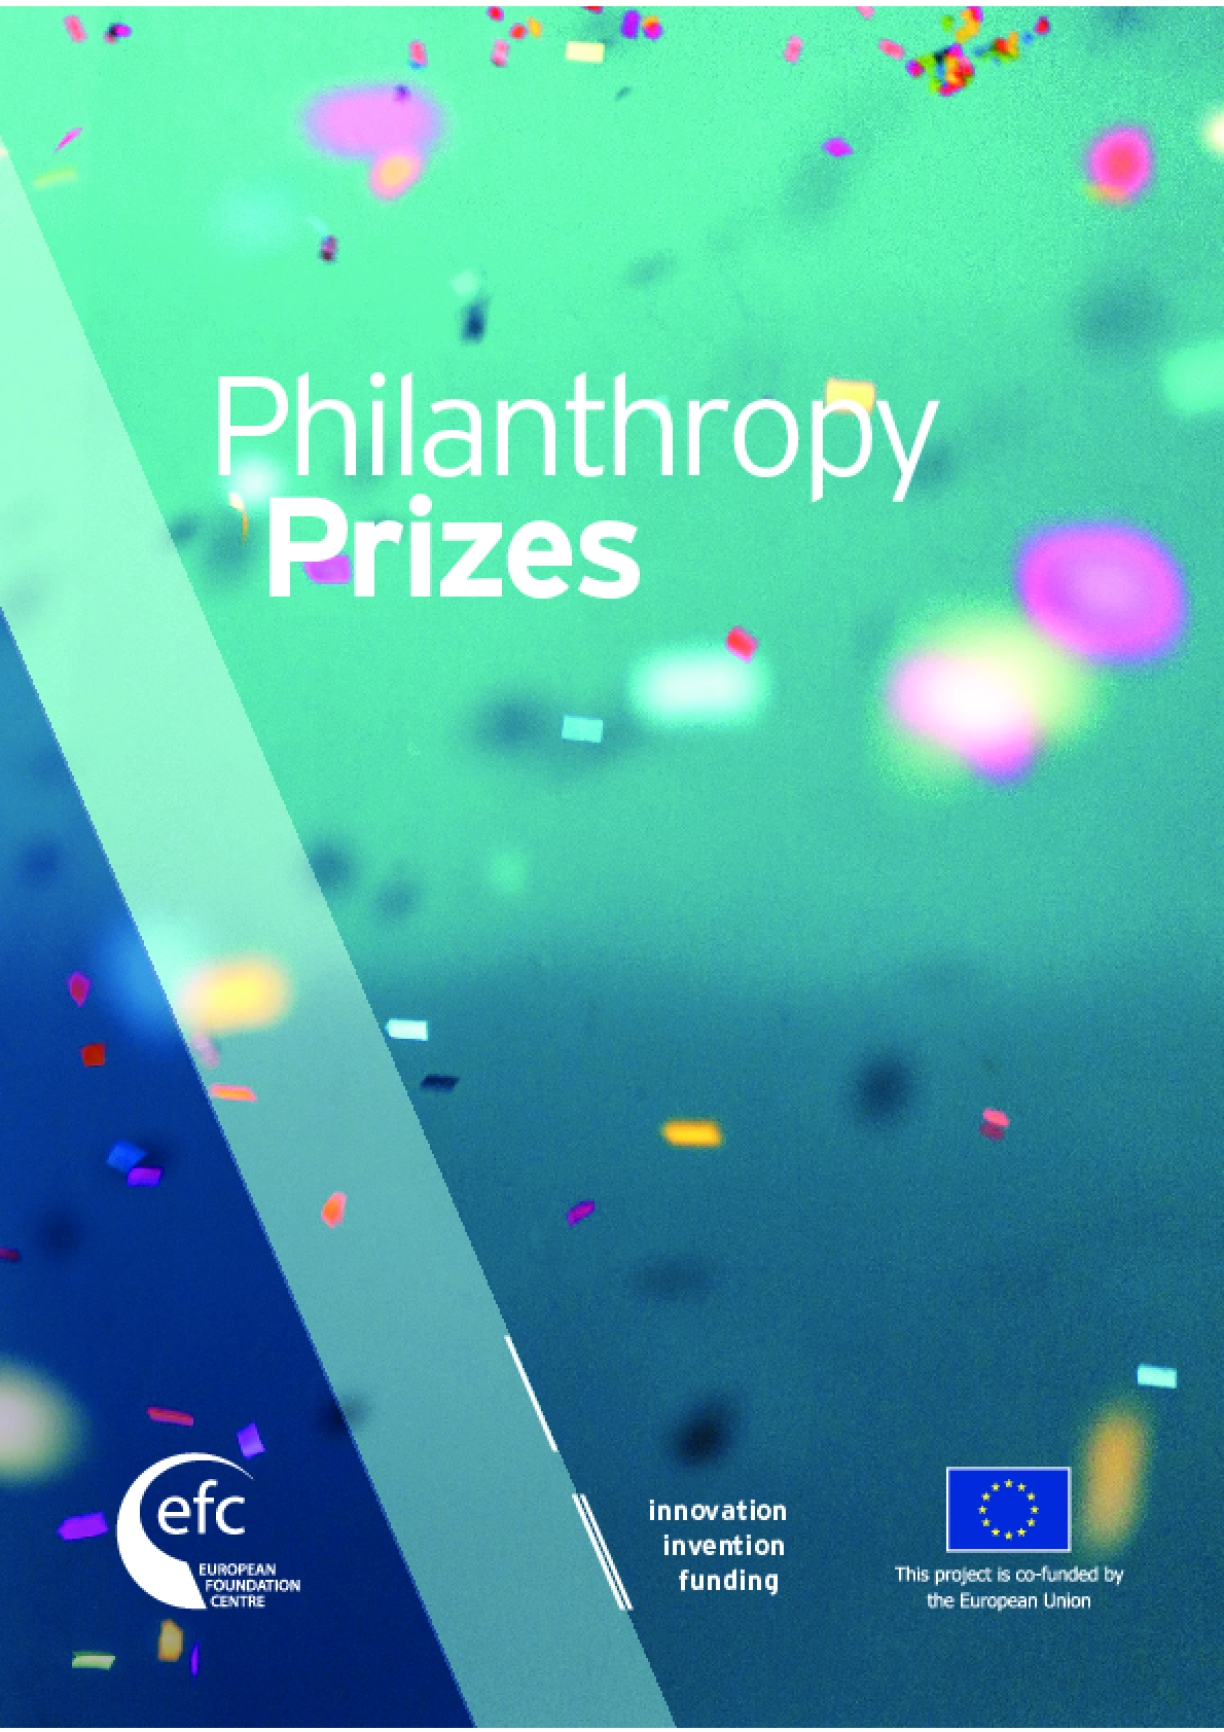 Philanthropy Prizes